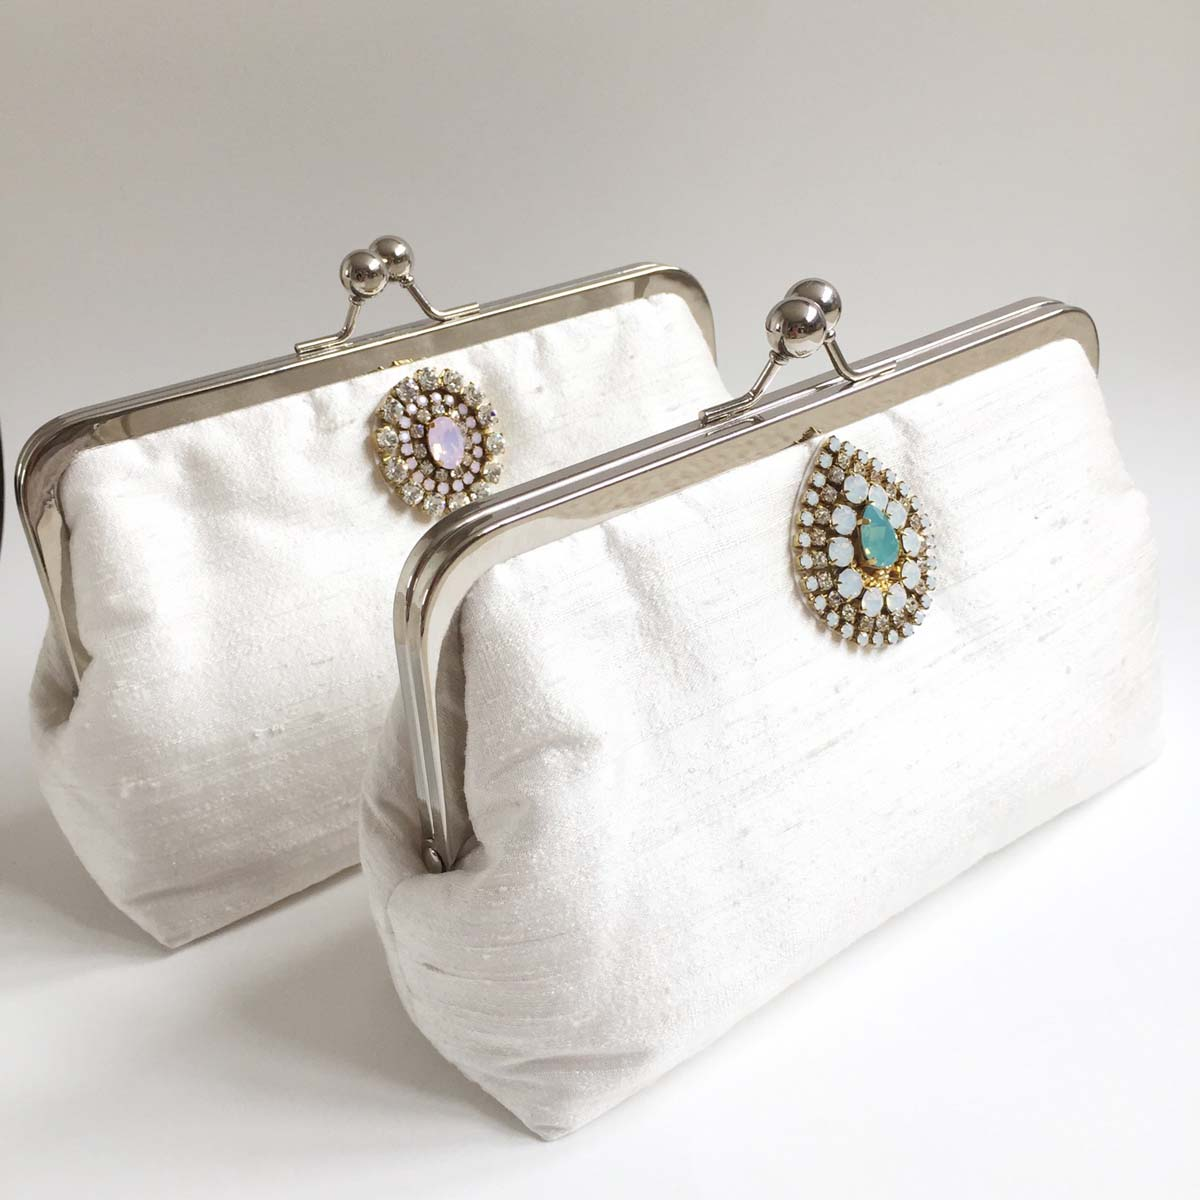 Handmade Raw Silk Beaded Bridal Clutch Bag No.2 - Victoria Millesime